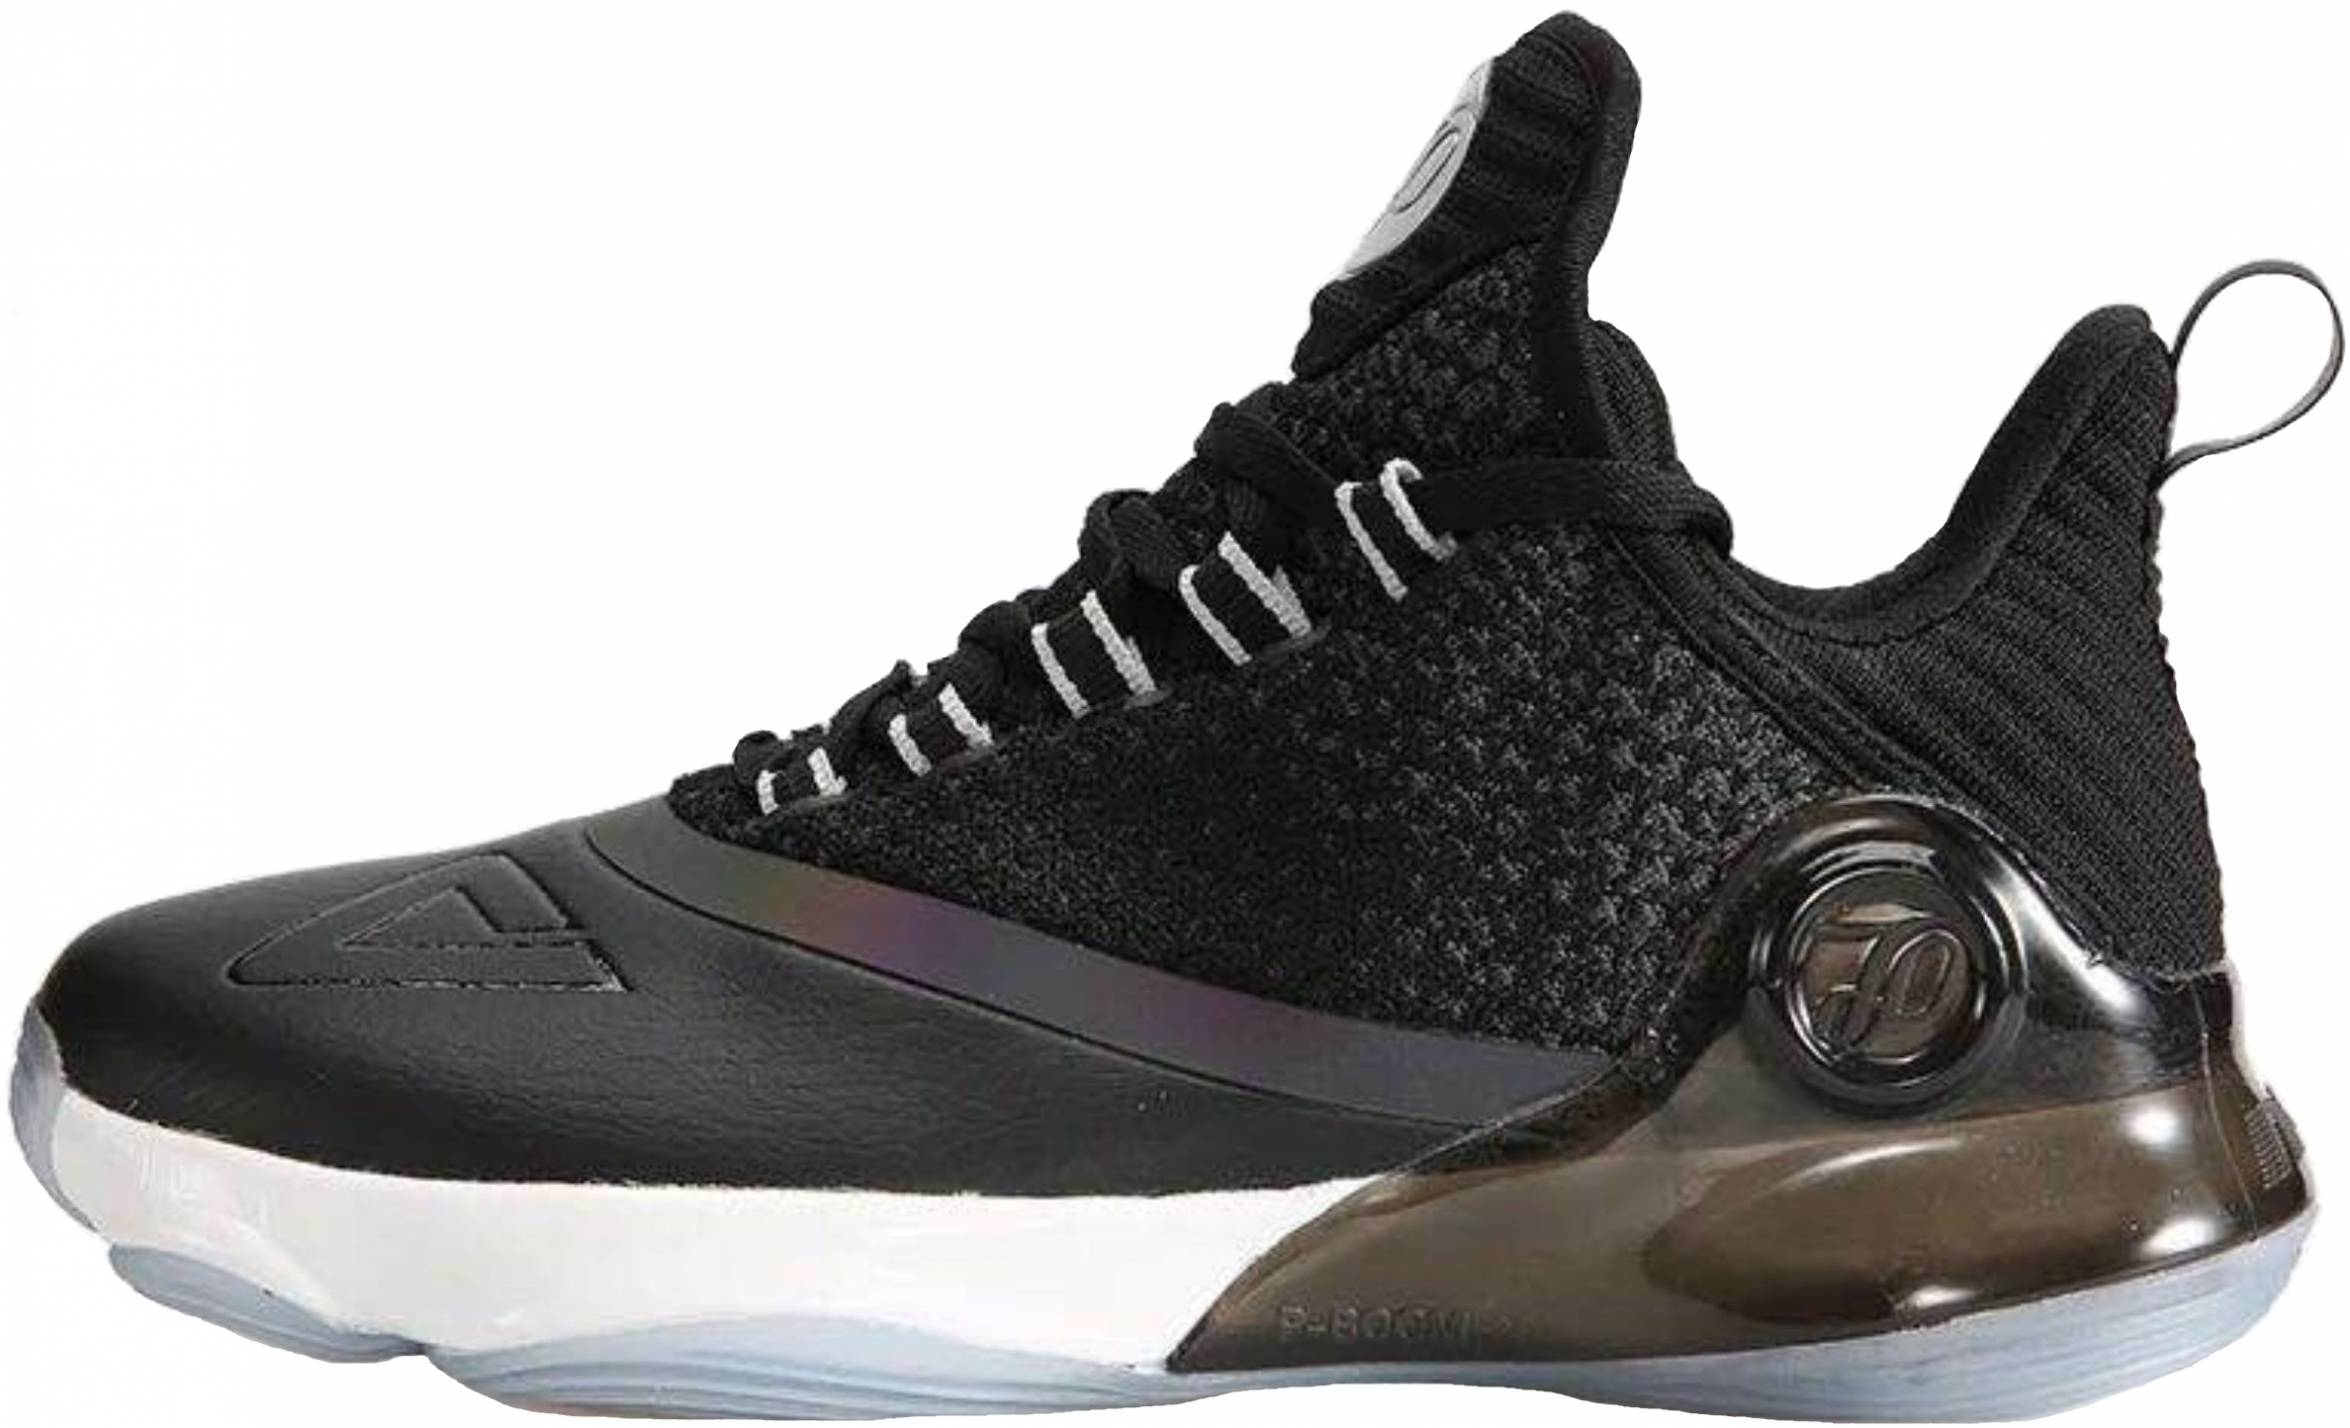 Save 49% on Slip-on Basketball Shoes